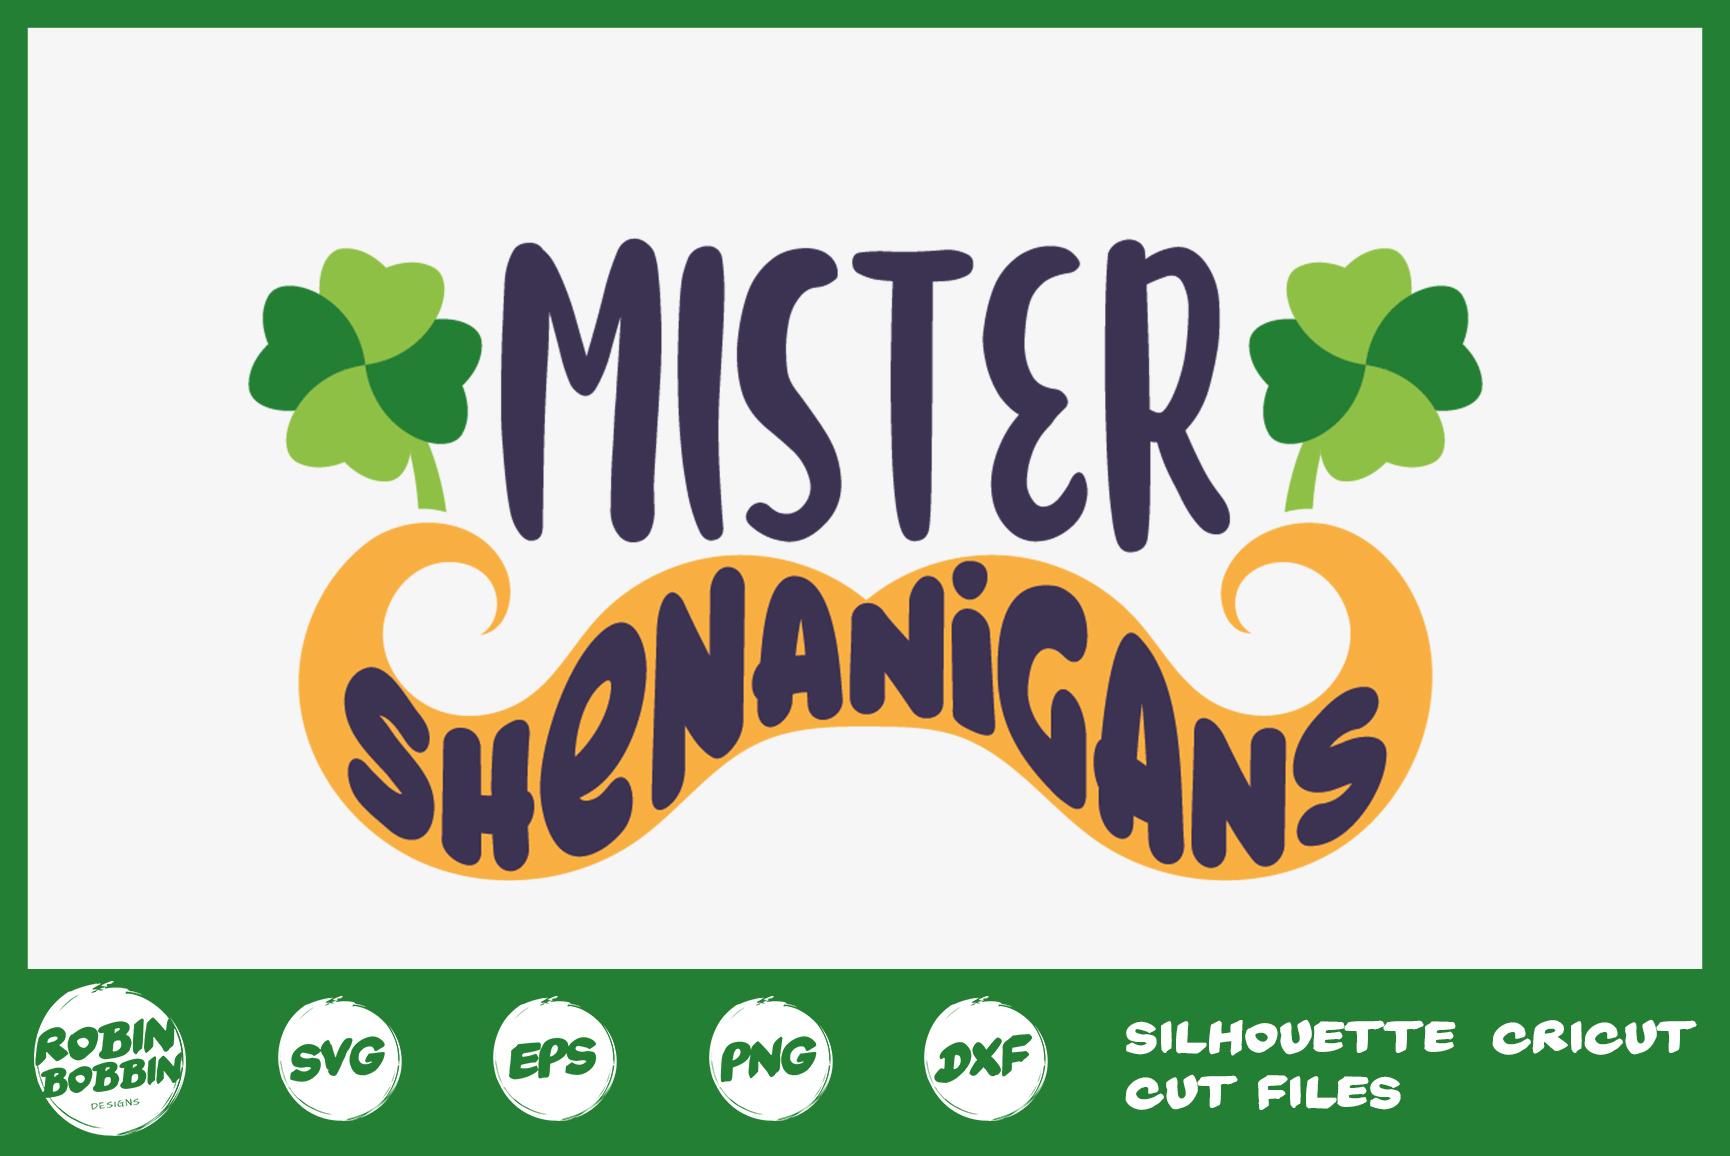 St. Patricks Day SVG, Mister Shenanigans SVG, Crafters SVG example image 1